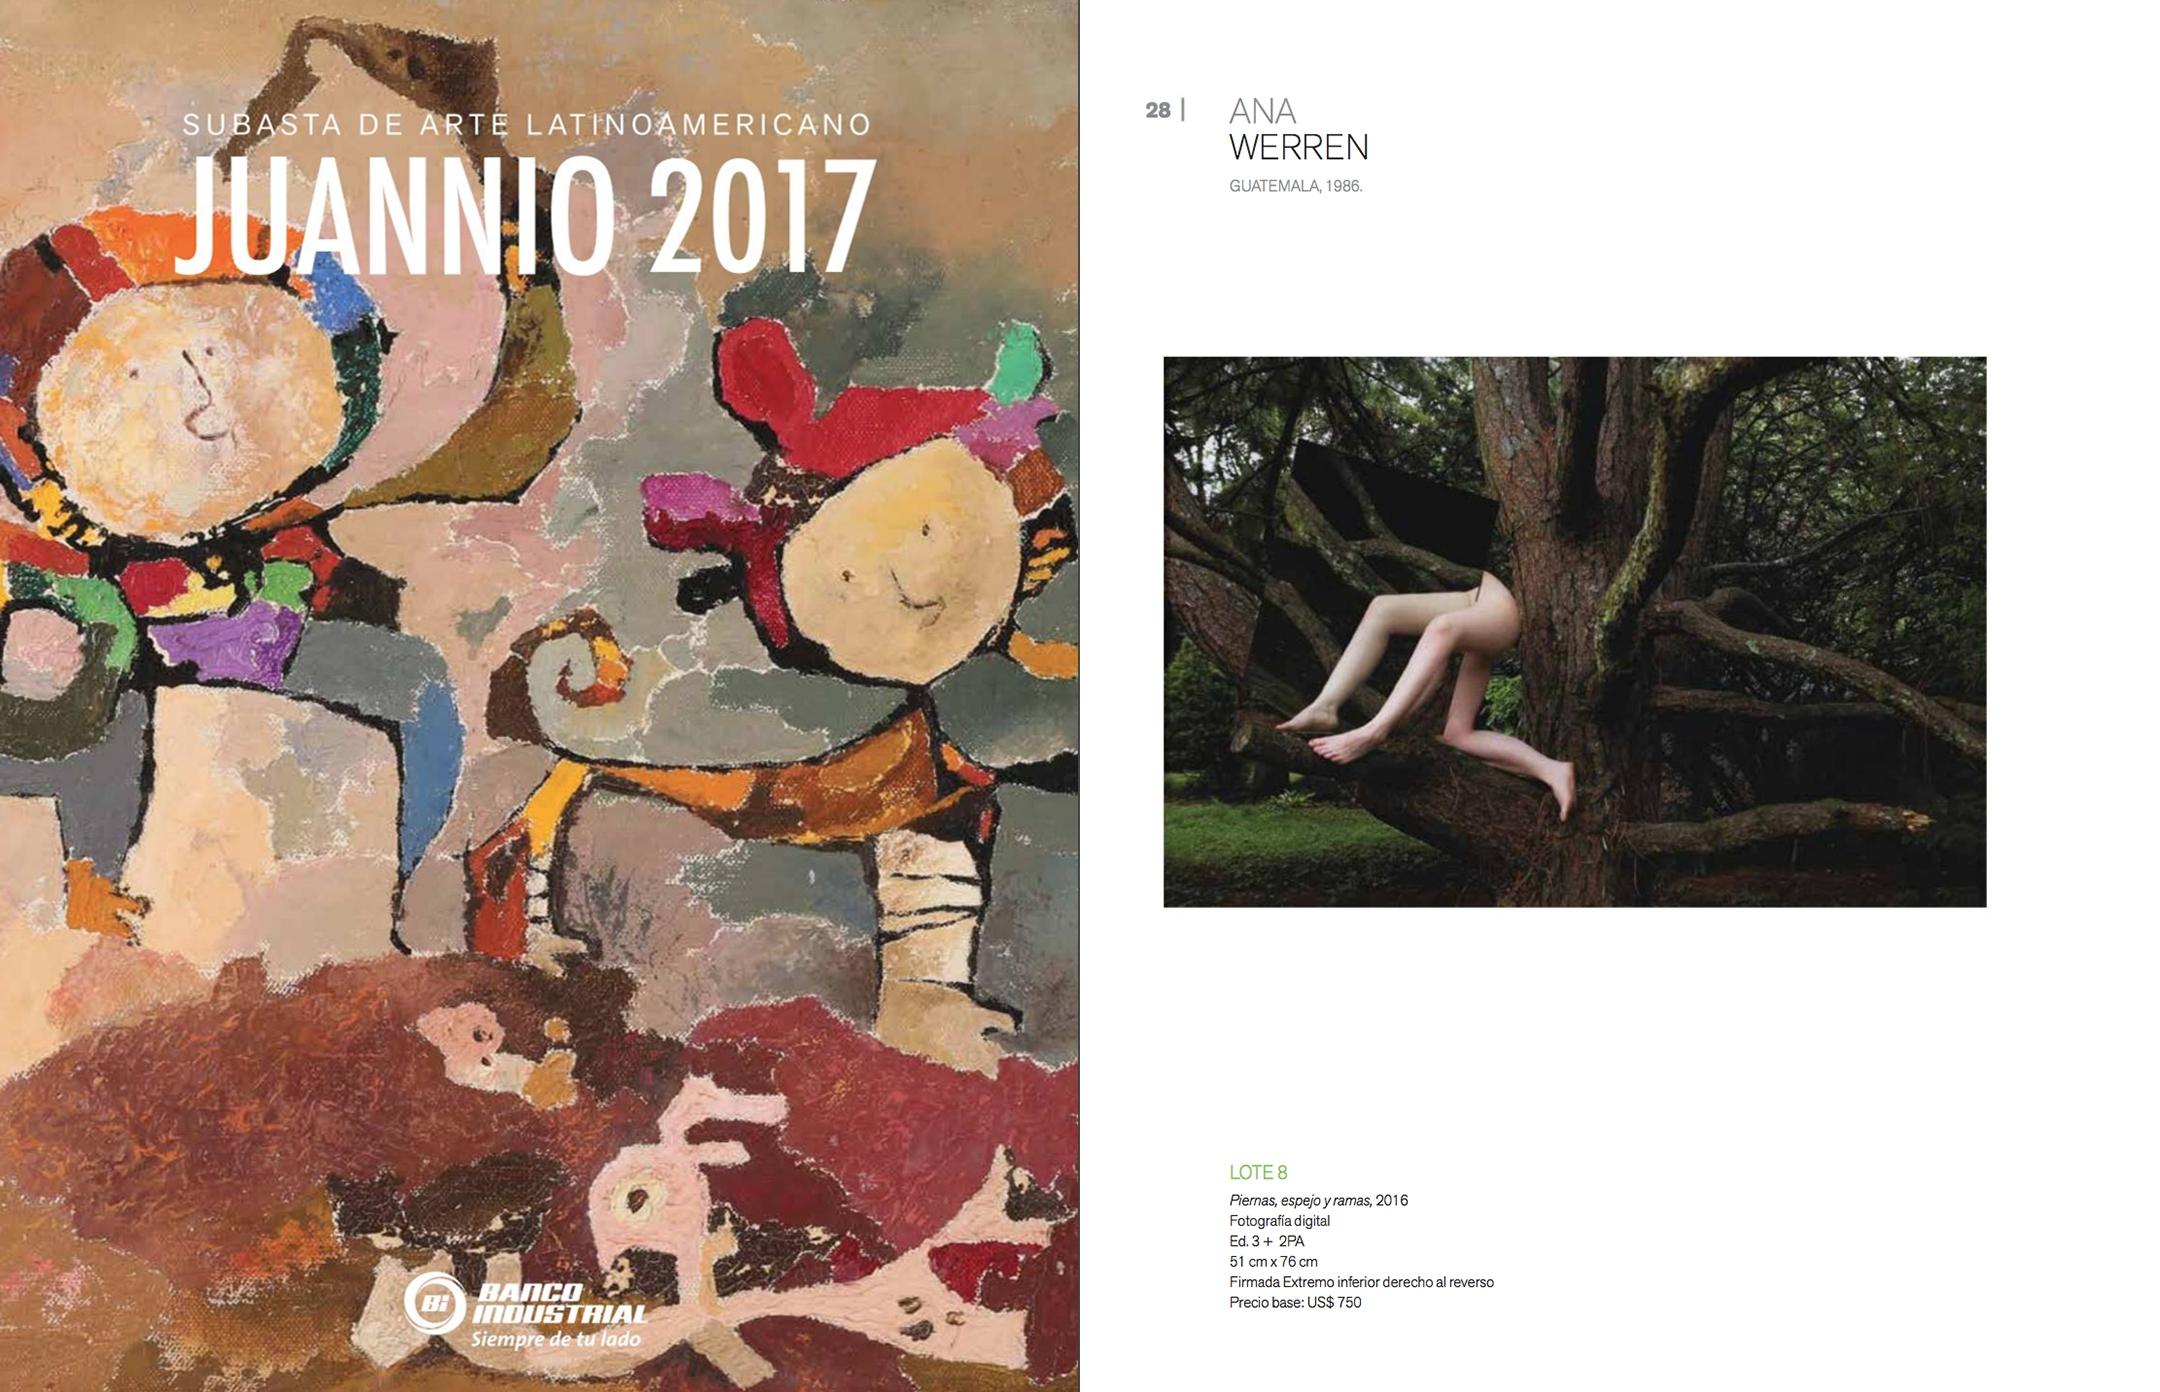 Juannio2017.jpg